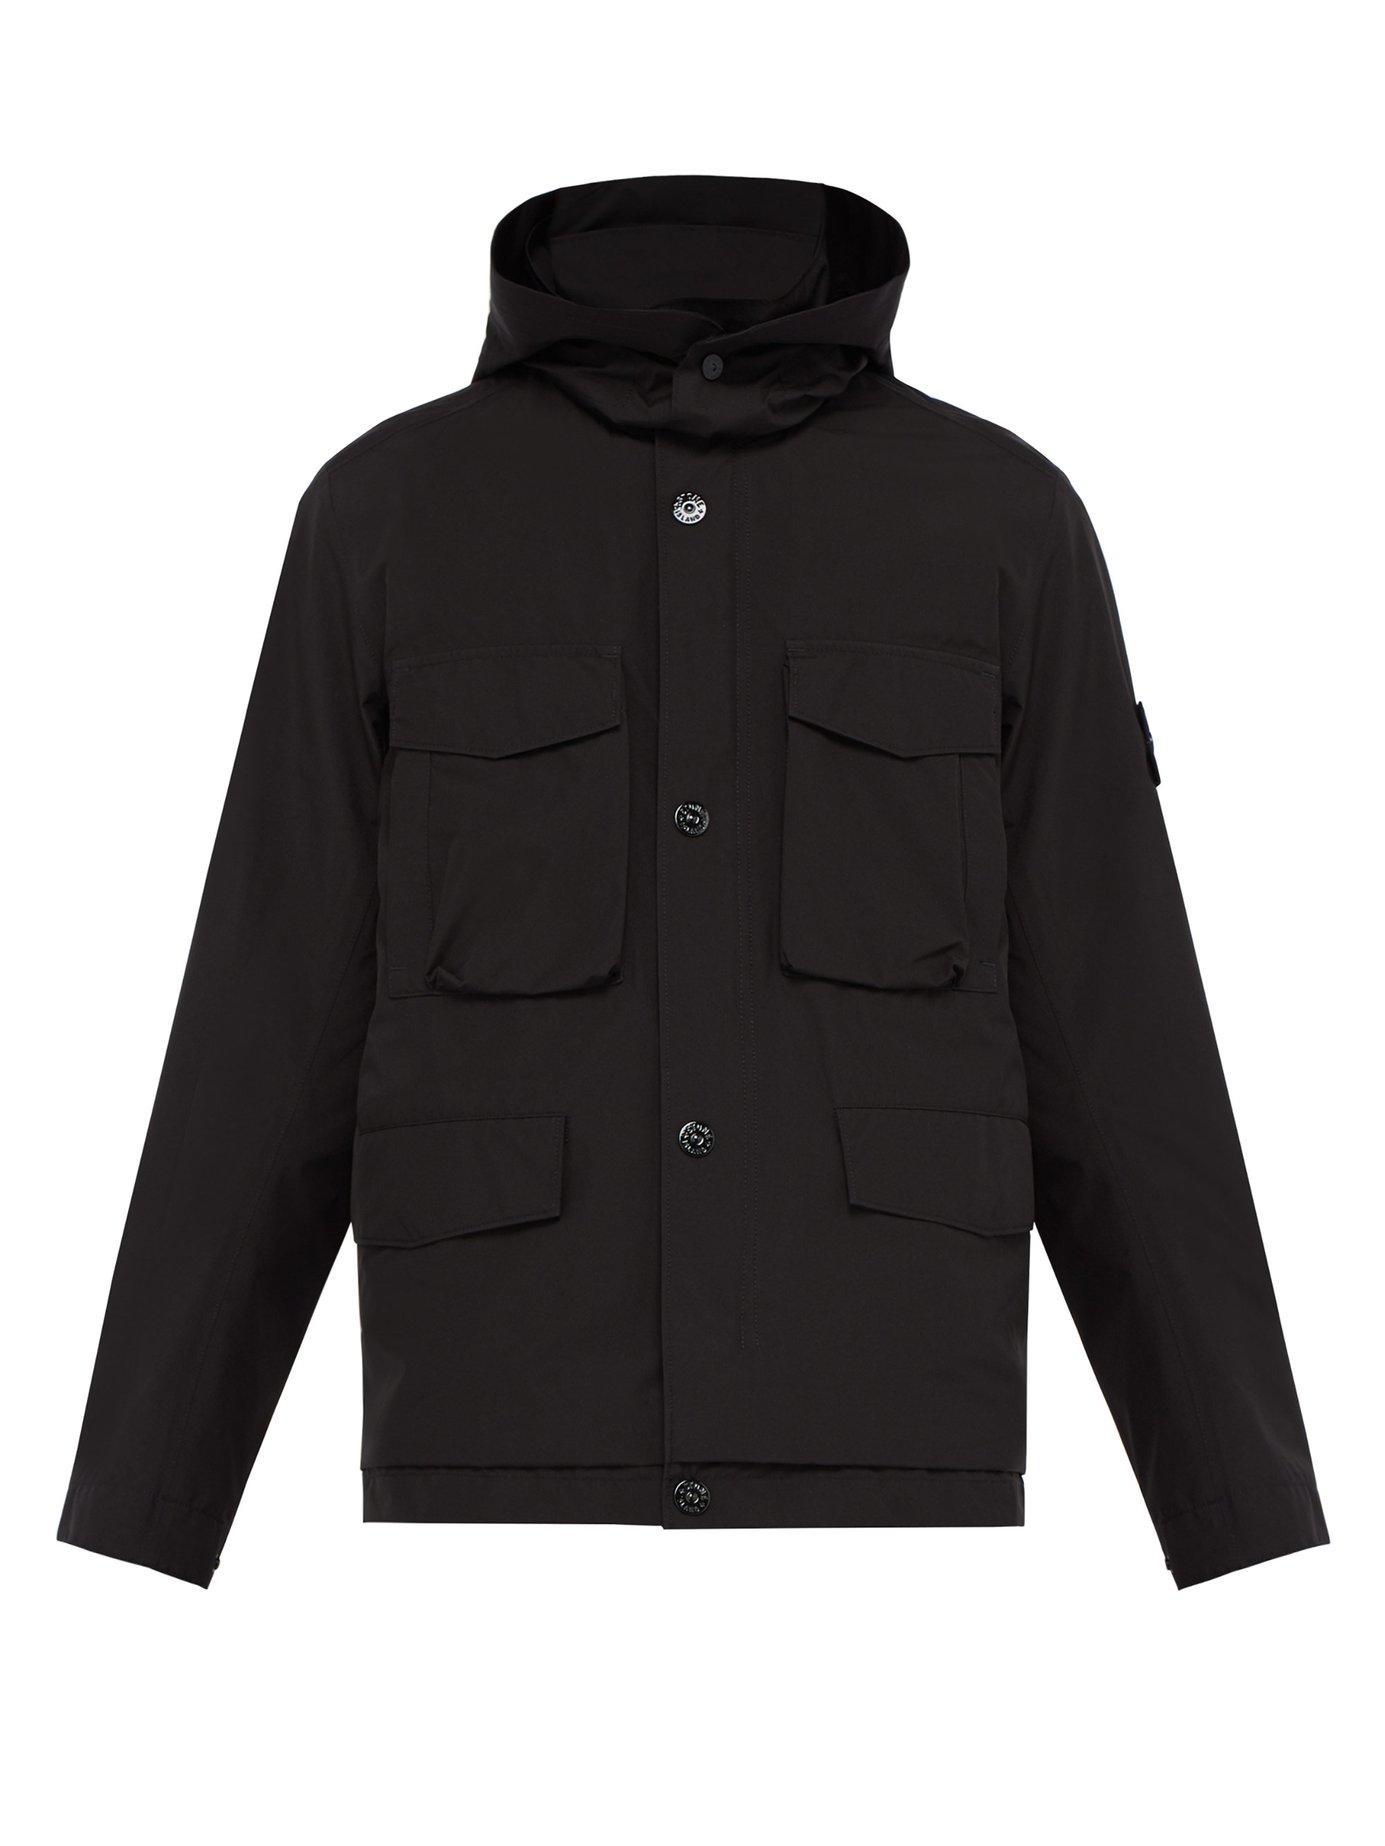 387506049 Men's Black Packaway Goretex Field Jacket